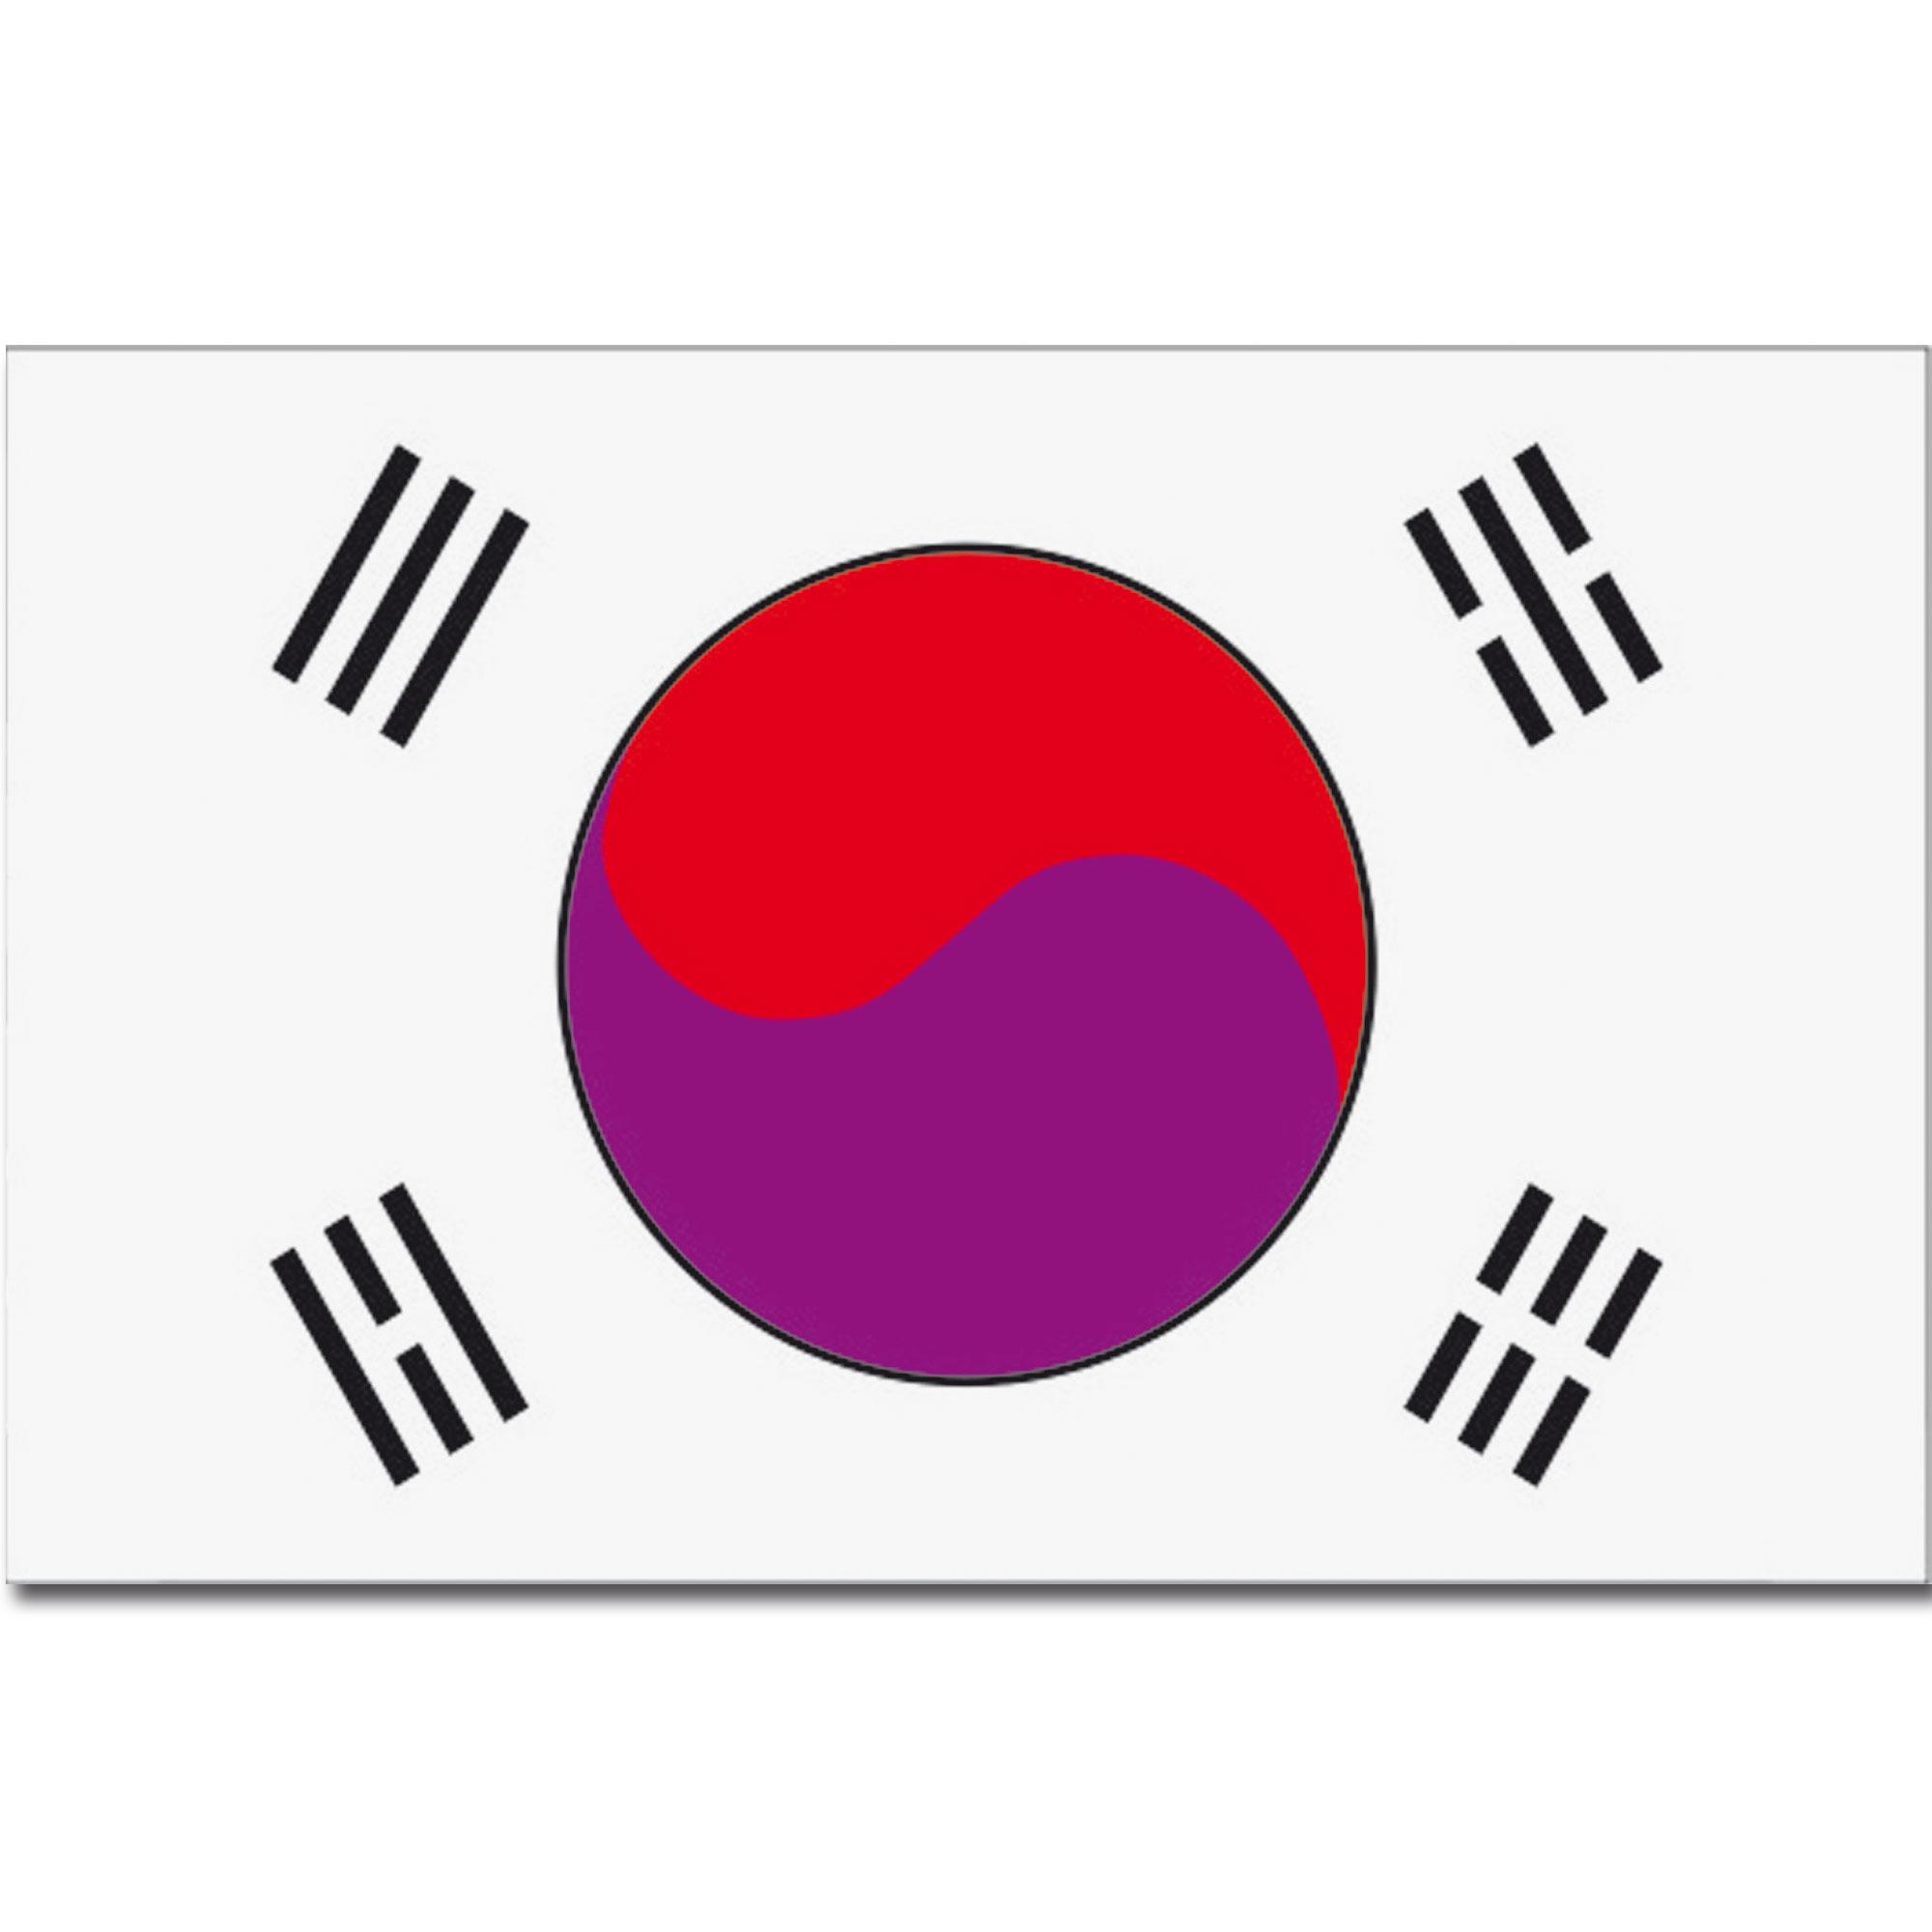 Flagge Korea (Süd)